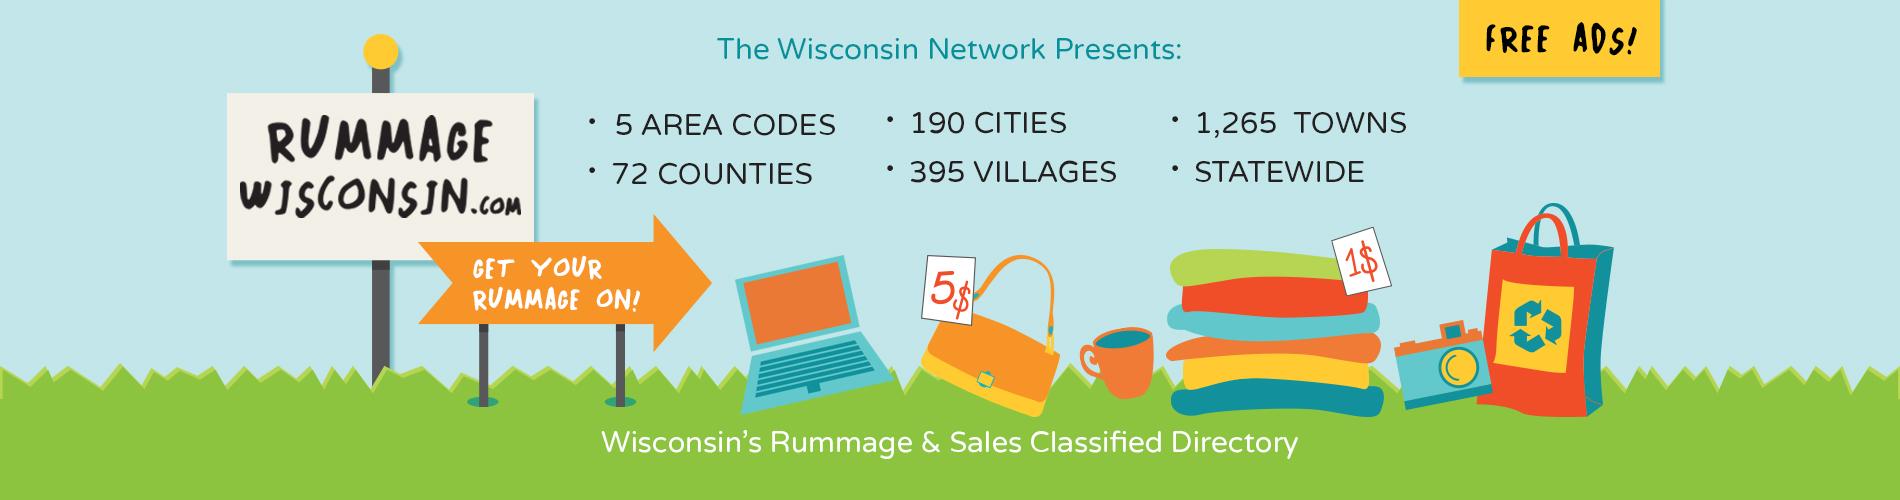 Rummage Wisconsin com, Free Rummage Sale Classified Ads, Rummage